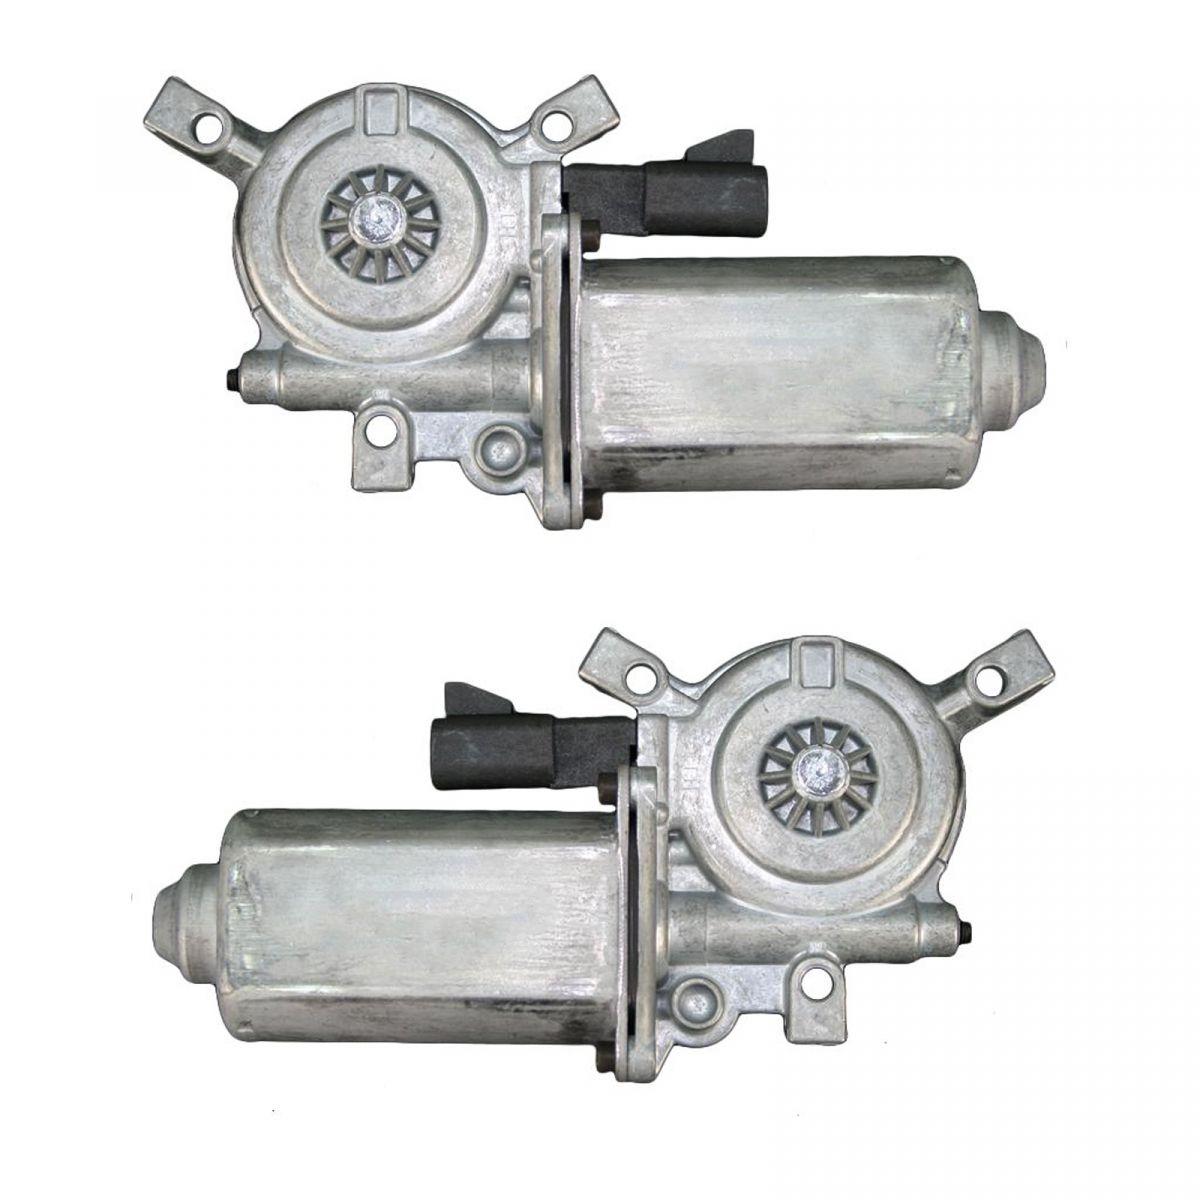 hight resolution of power window motors pair set for chevy pontiac olds malibu venture montana van